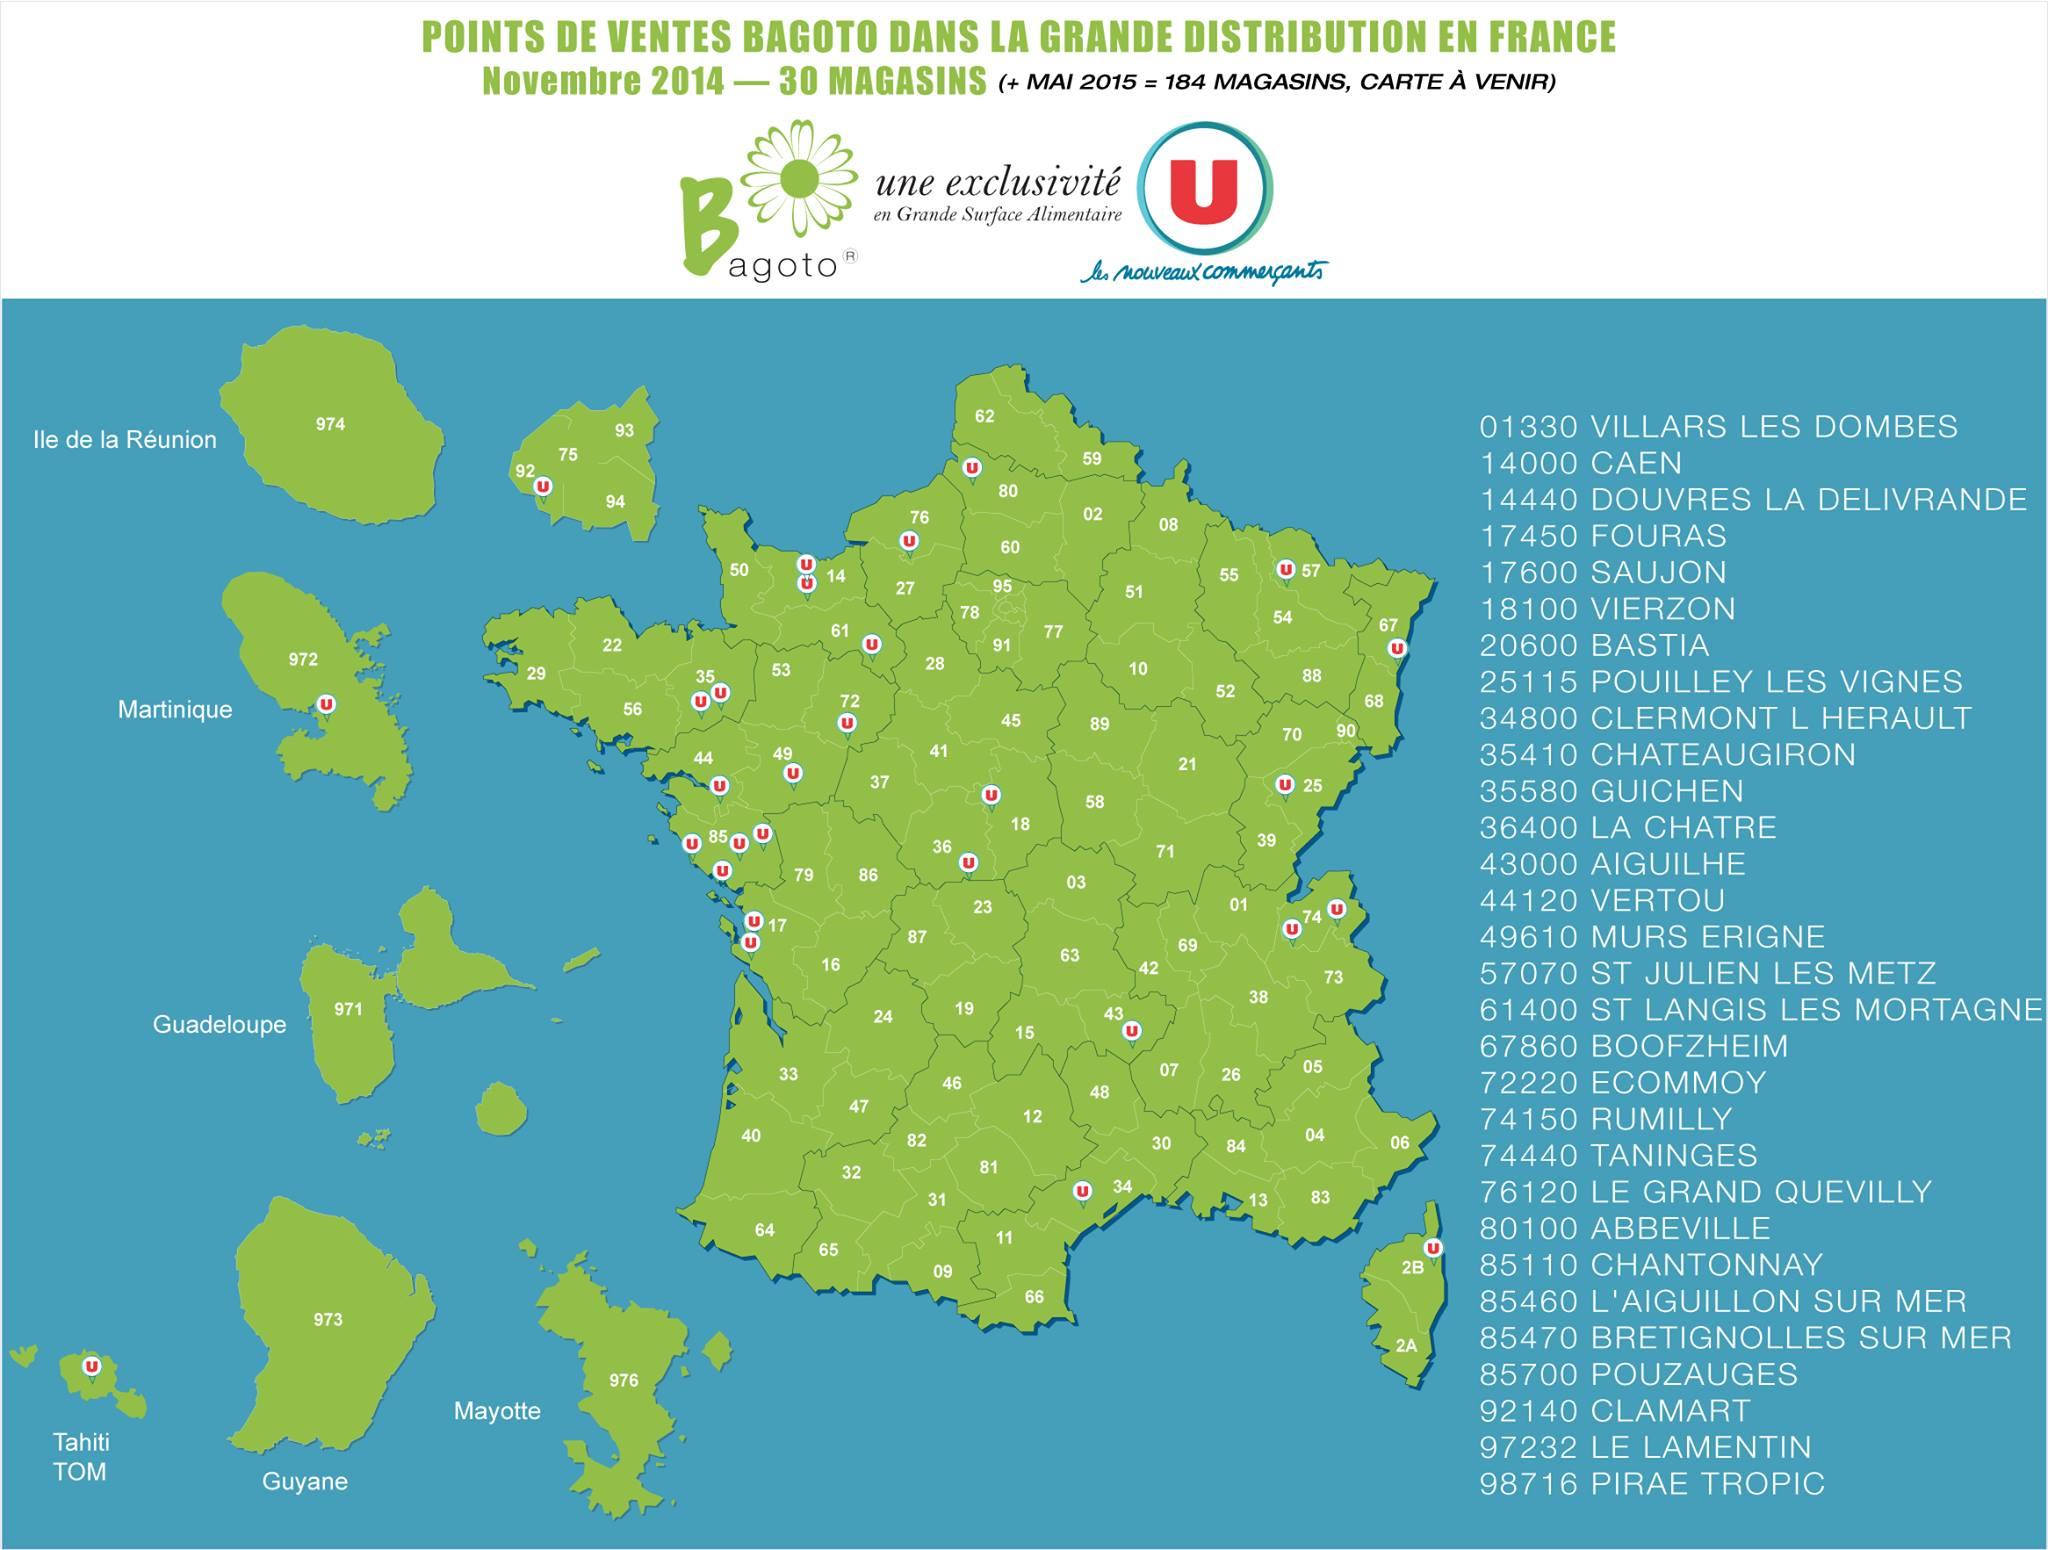 Carte bagoto systeme u 11 2014 bagoto - Liste des magasins d usine en france ...